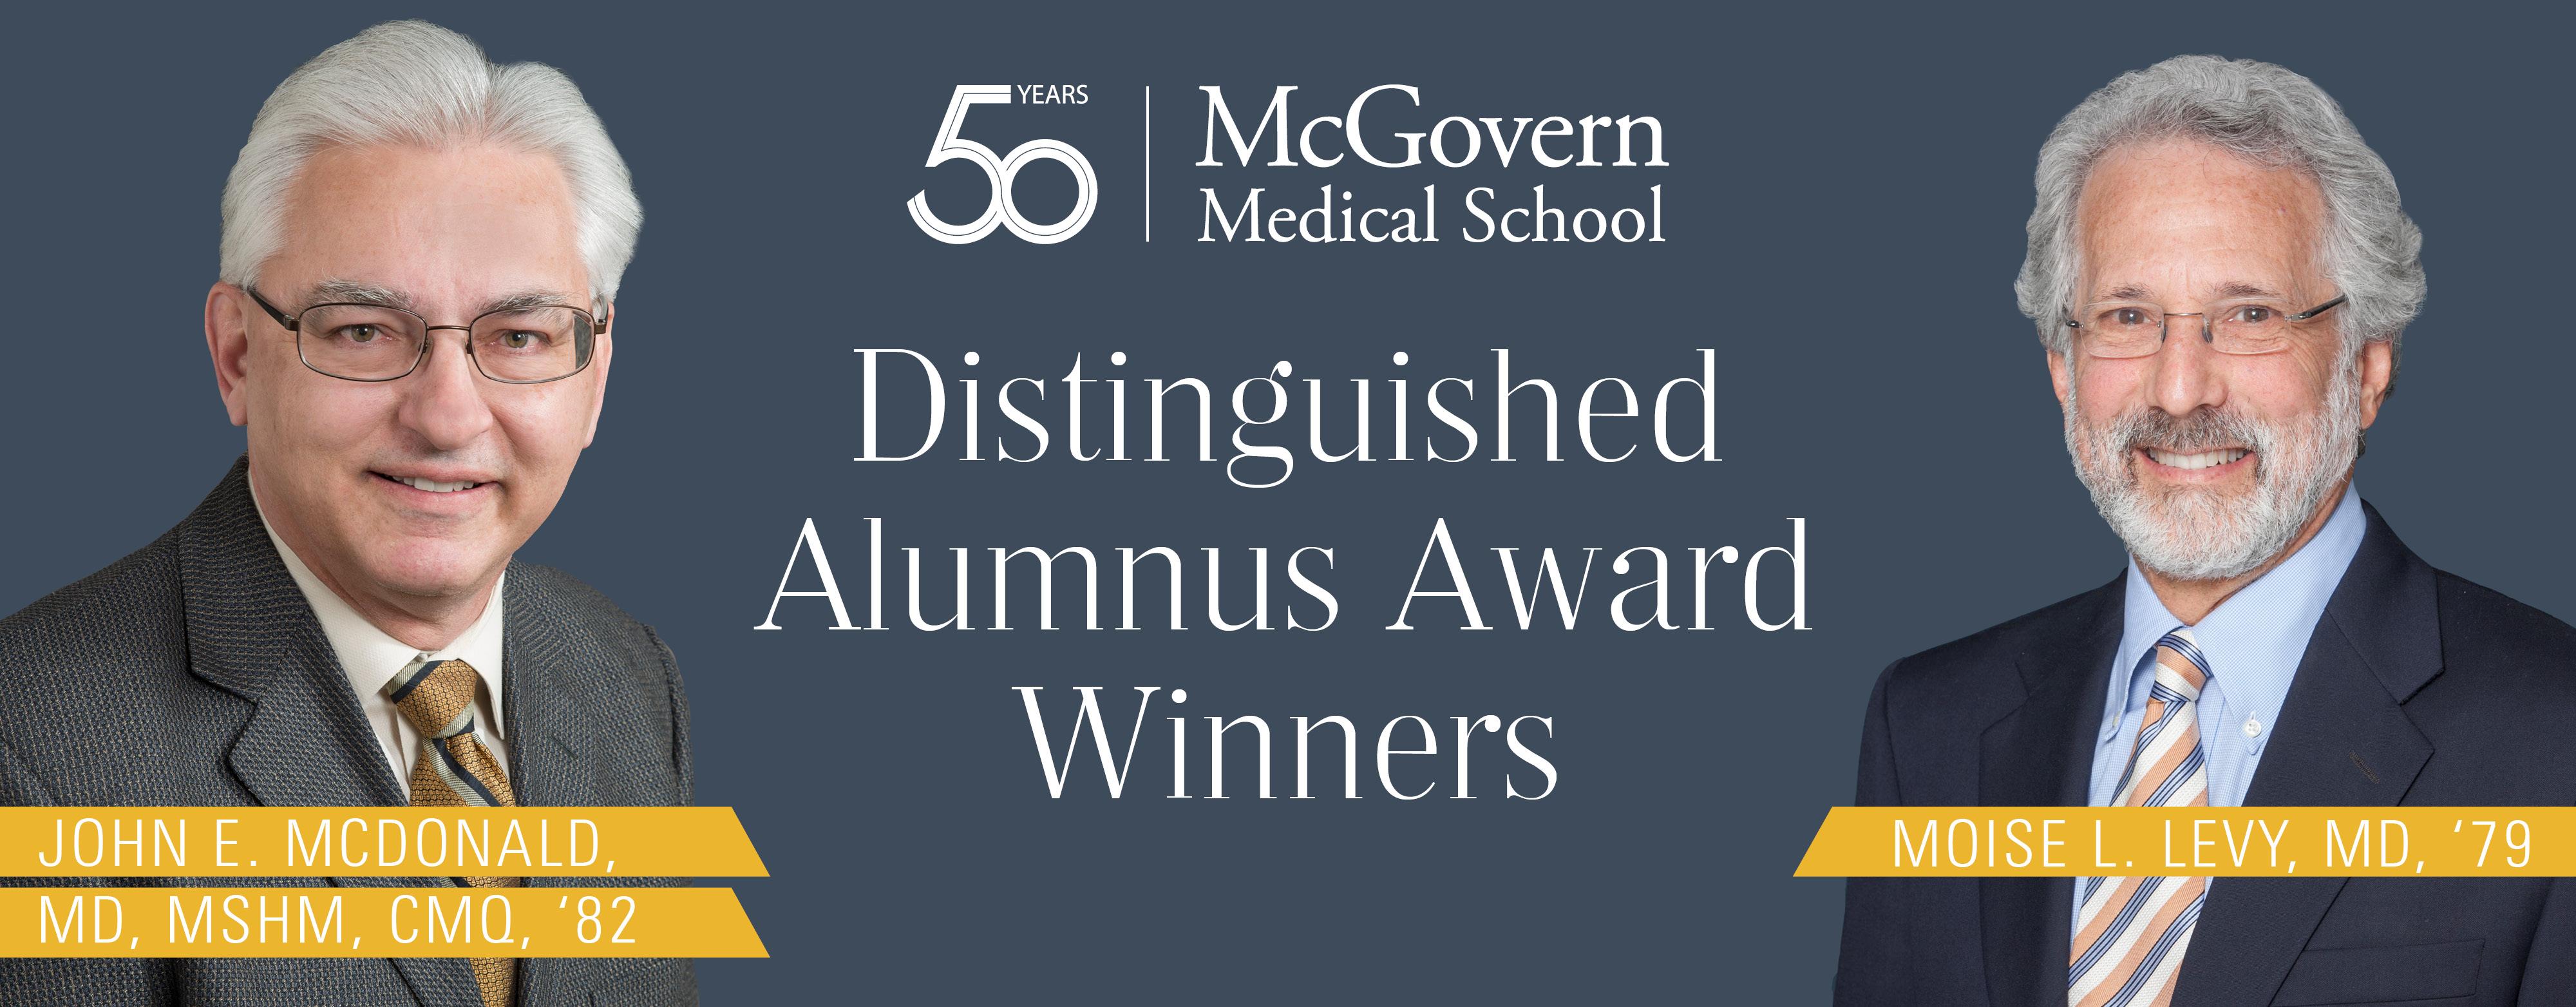 Distinguished Alumnus Award Winners